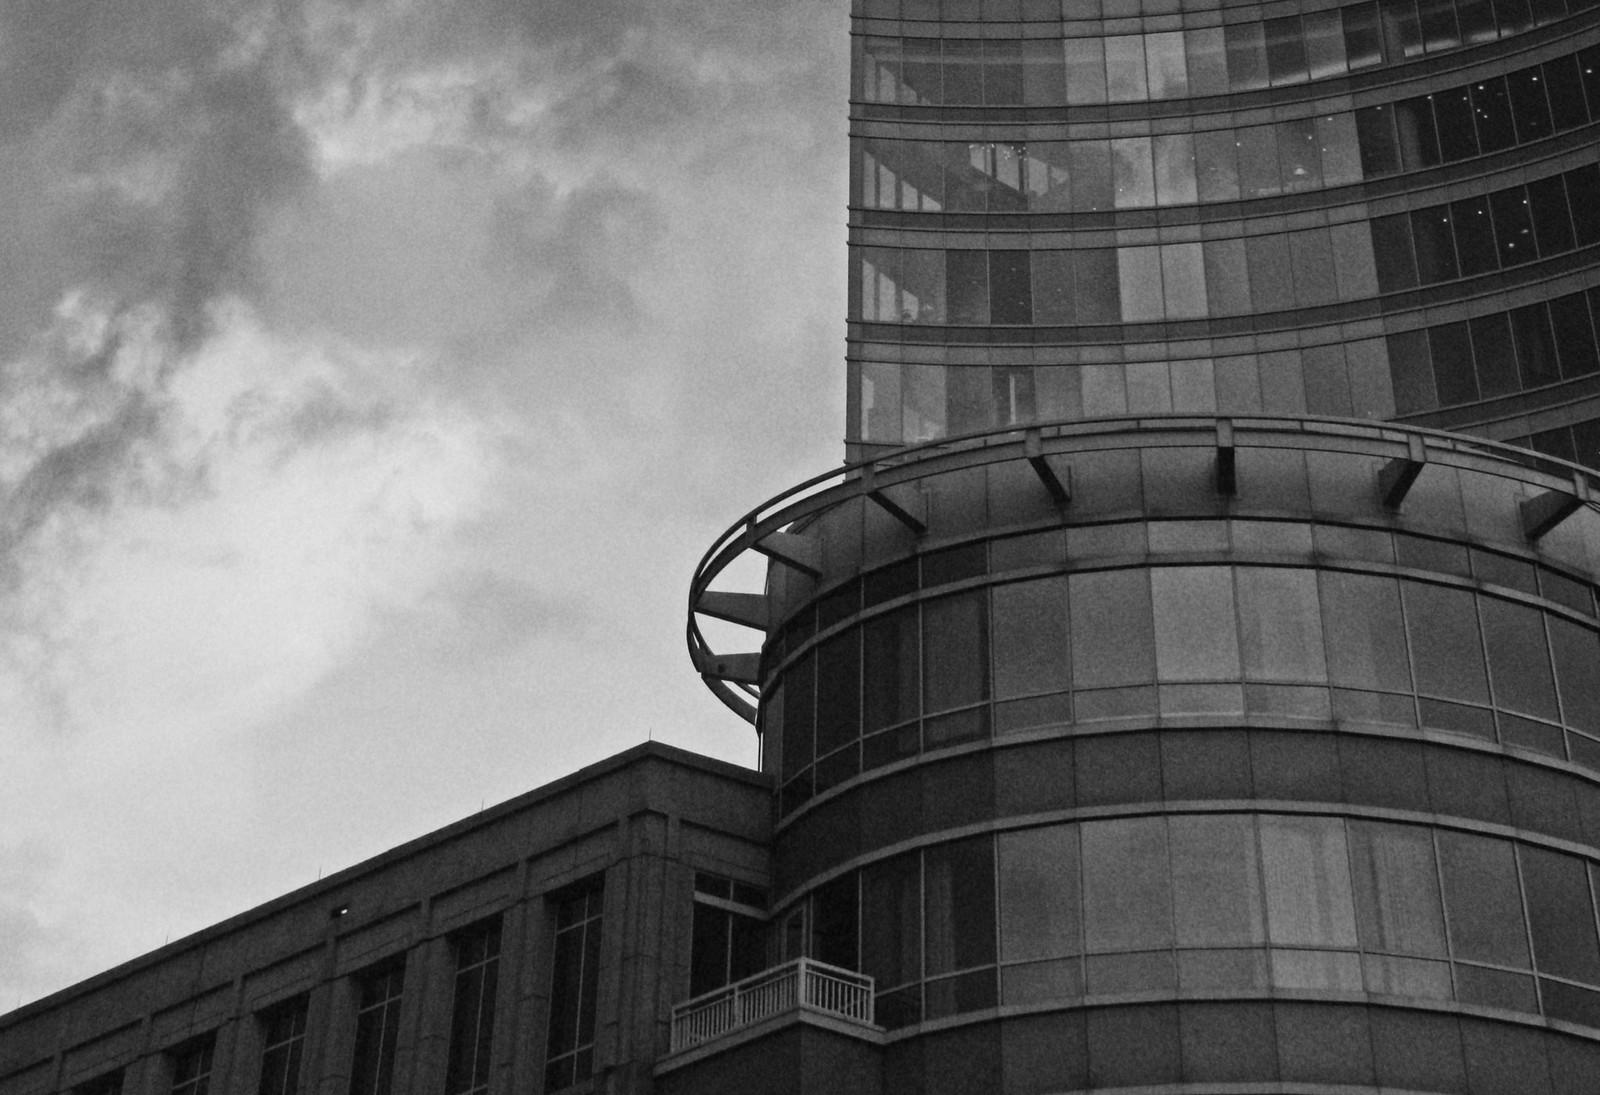 The Invesco Building, Midtown Atlanta, Sept 2014